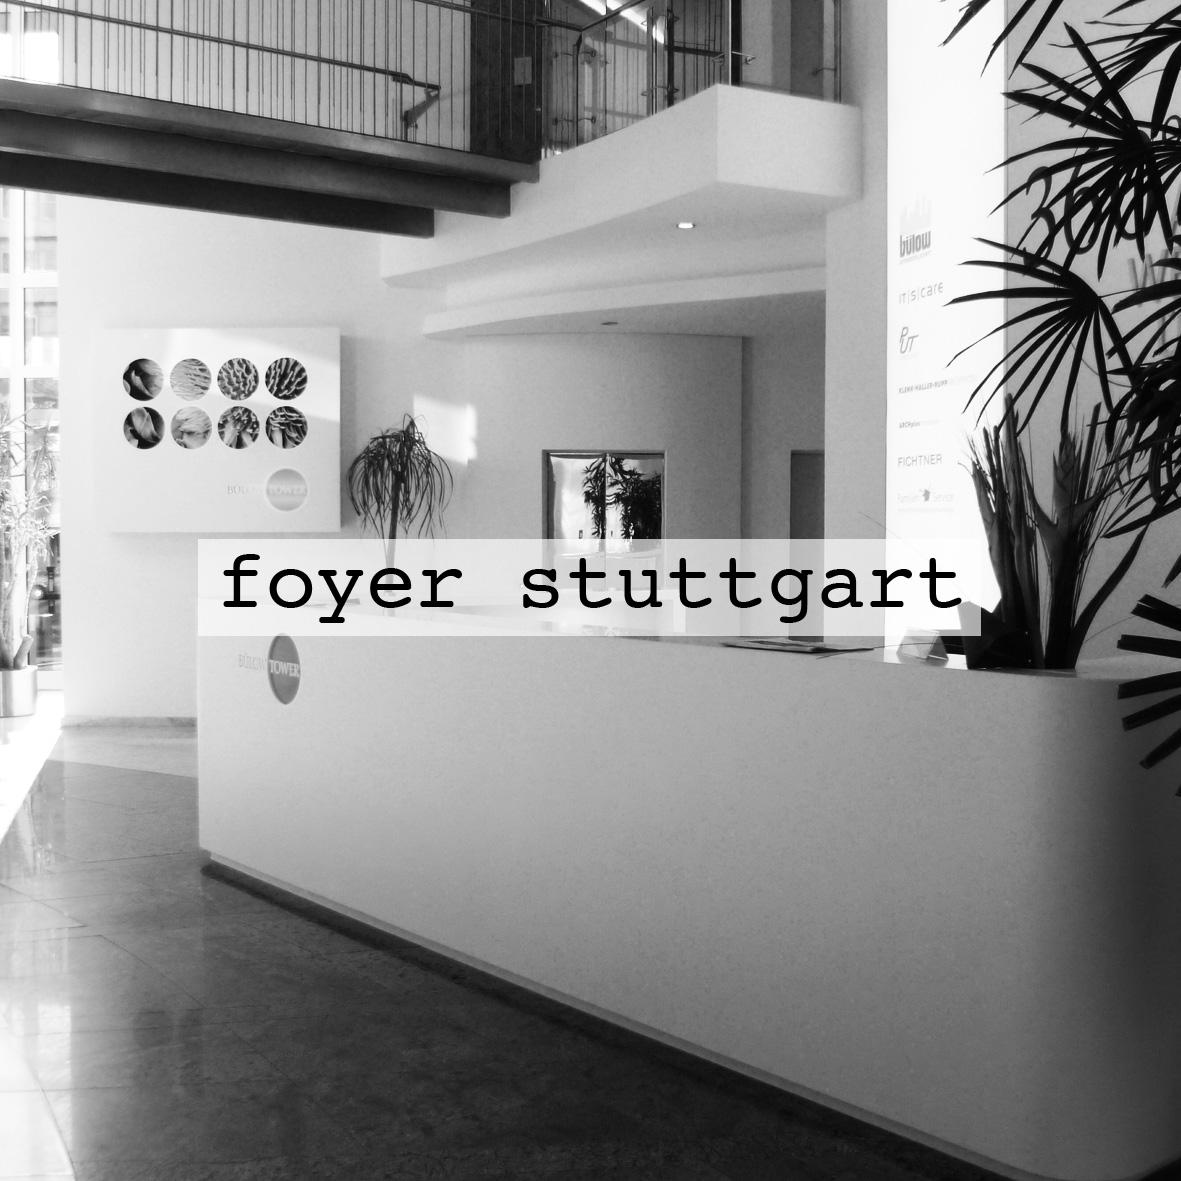 Foyer Bülow Tower Stuttgart